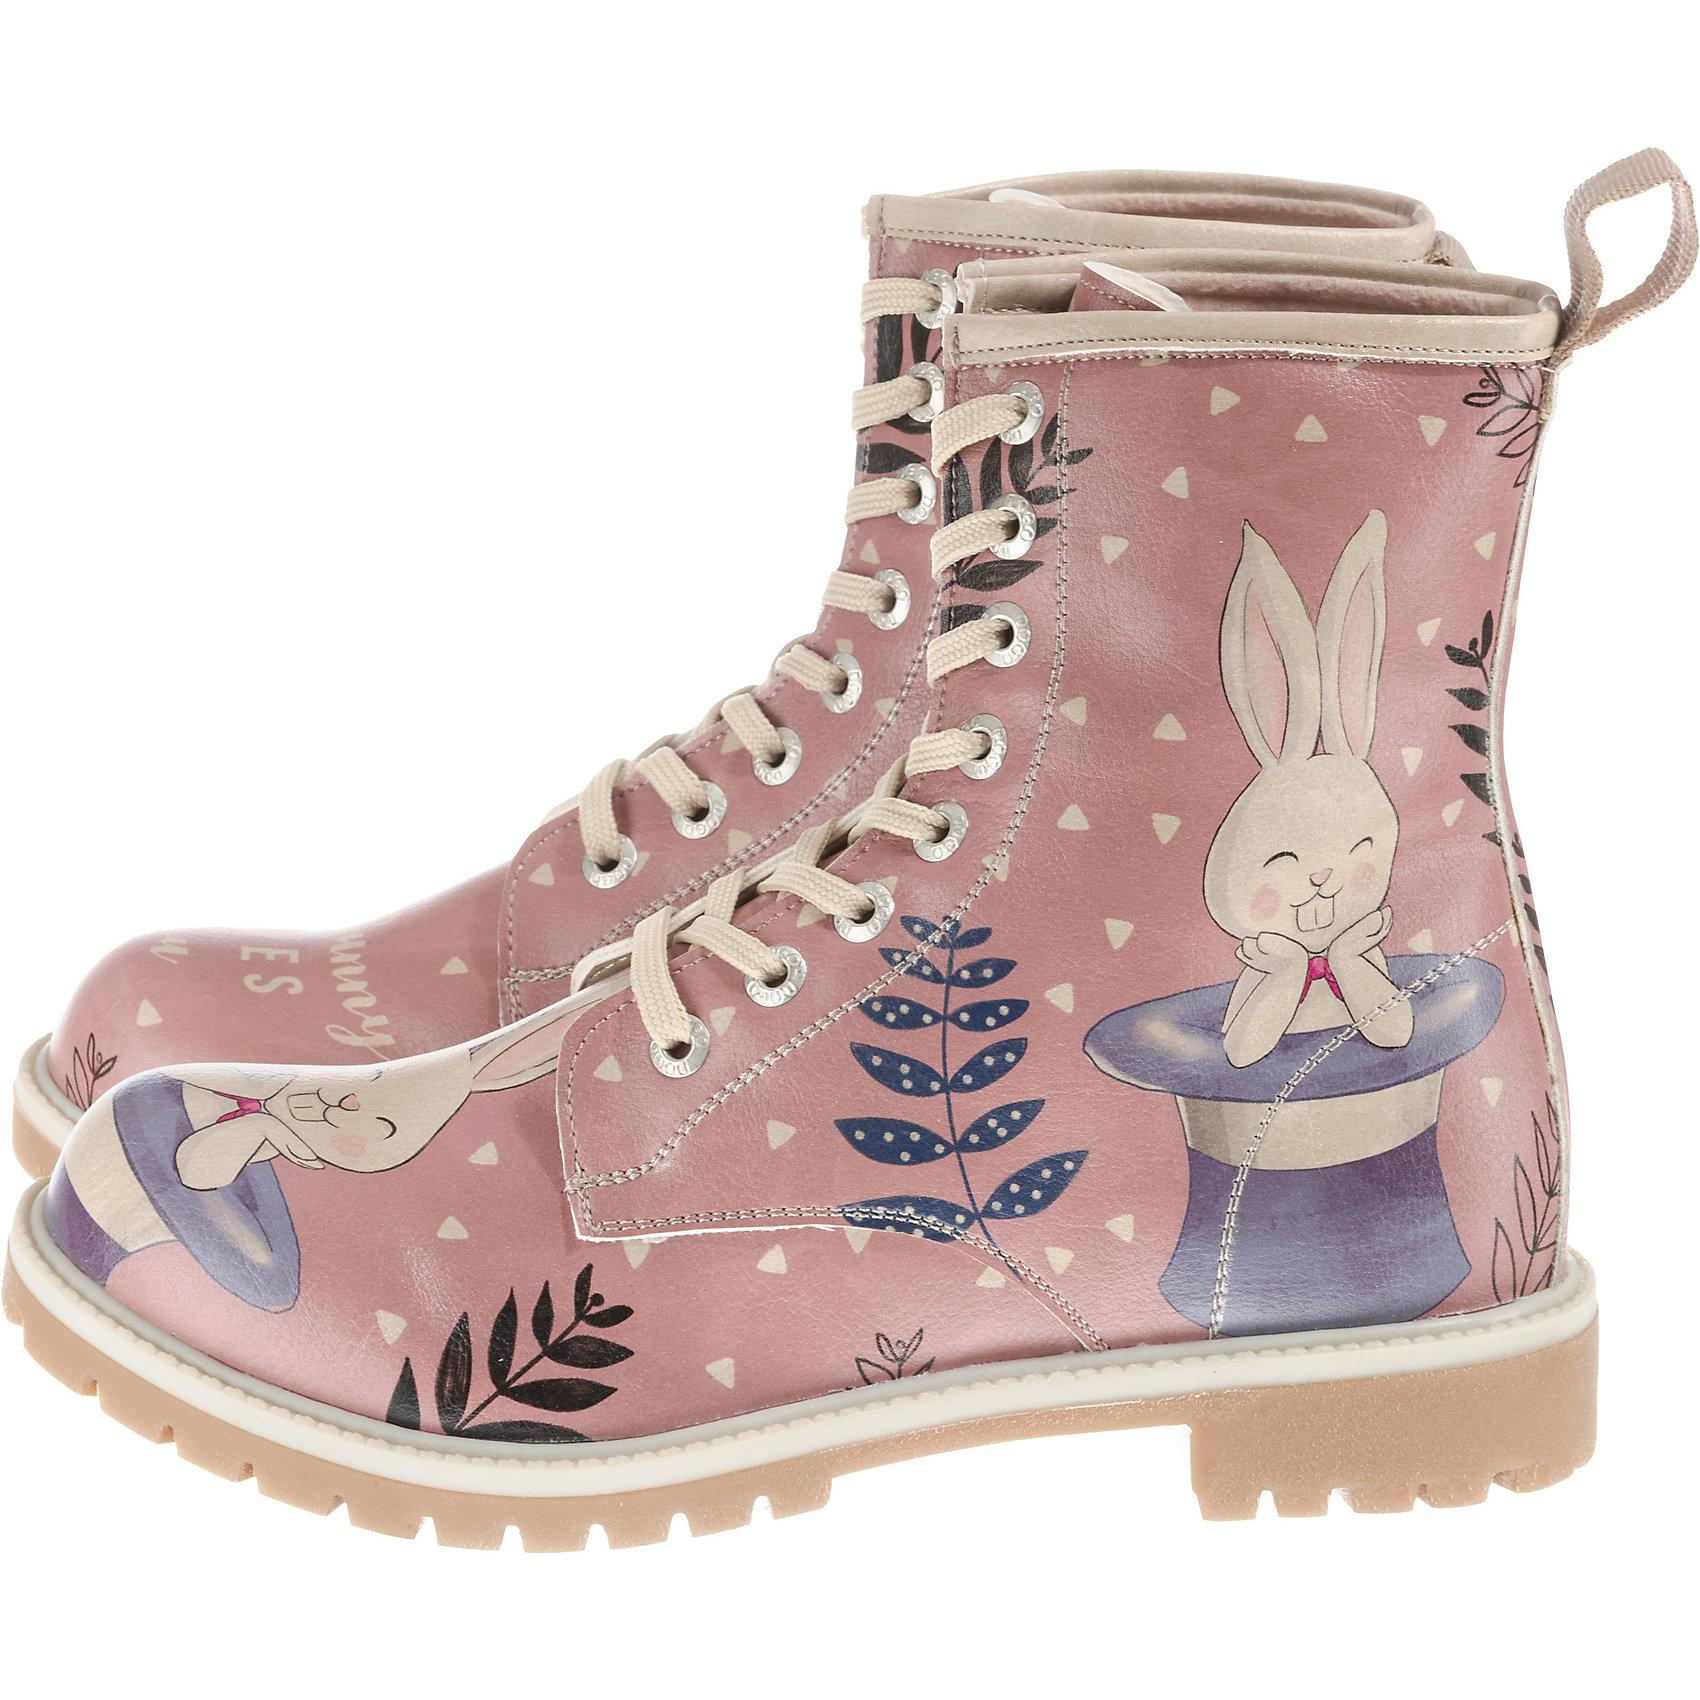 Dogo Shoes, Somebunny Loves You Schnürstiefel, rosa